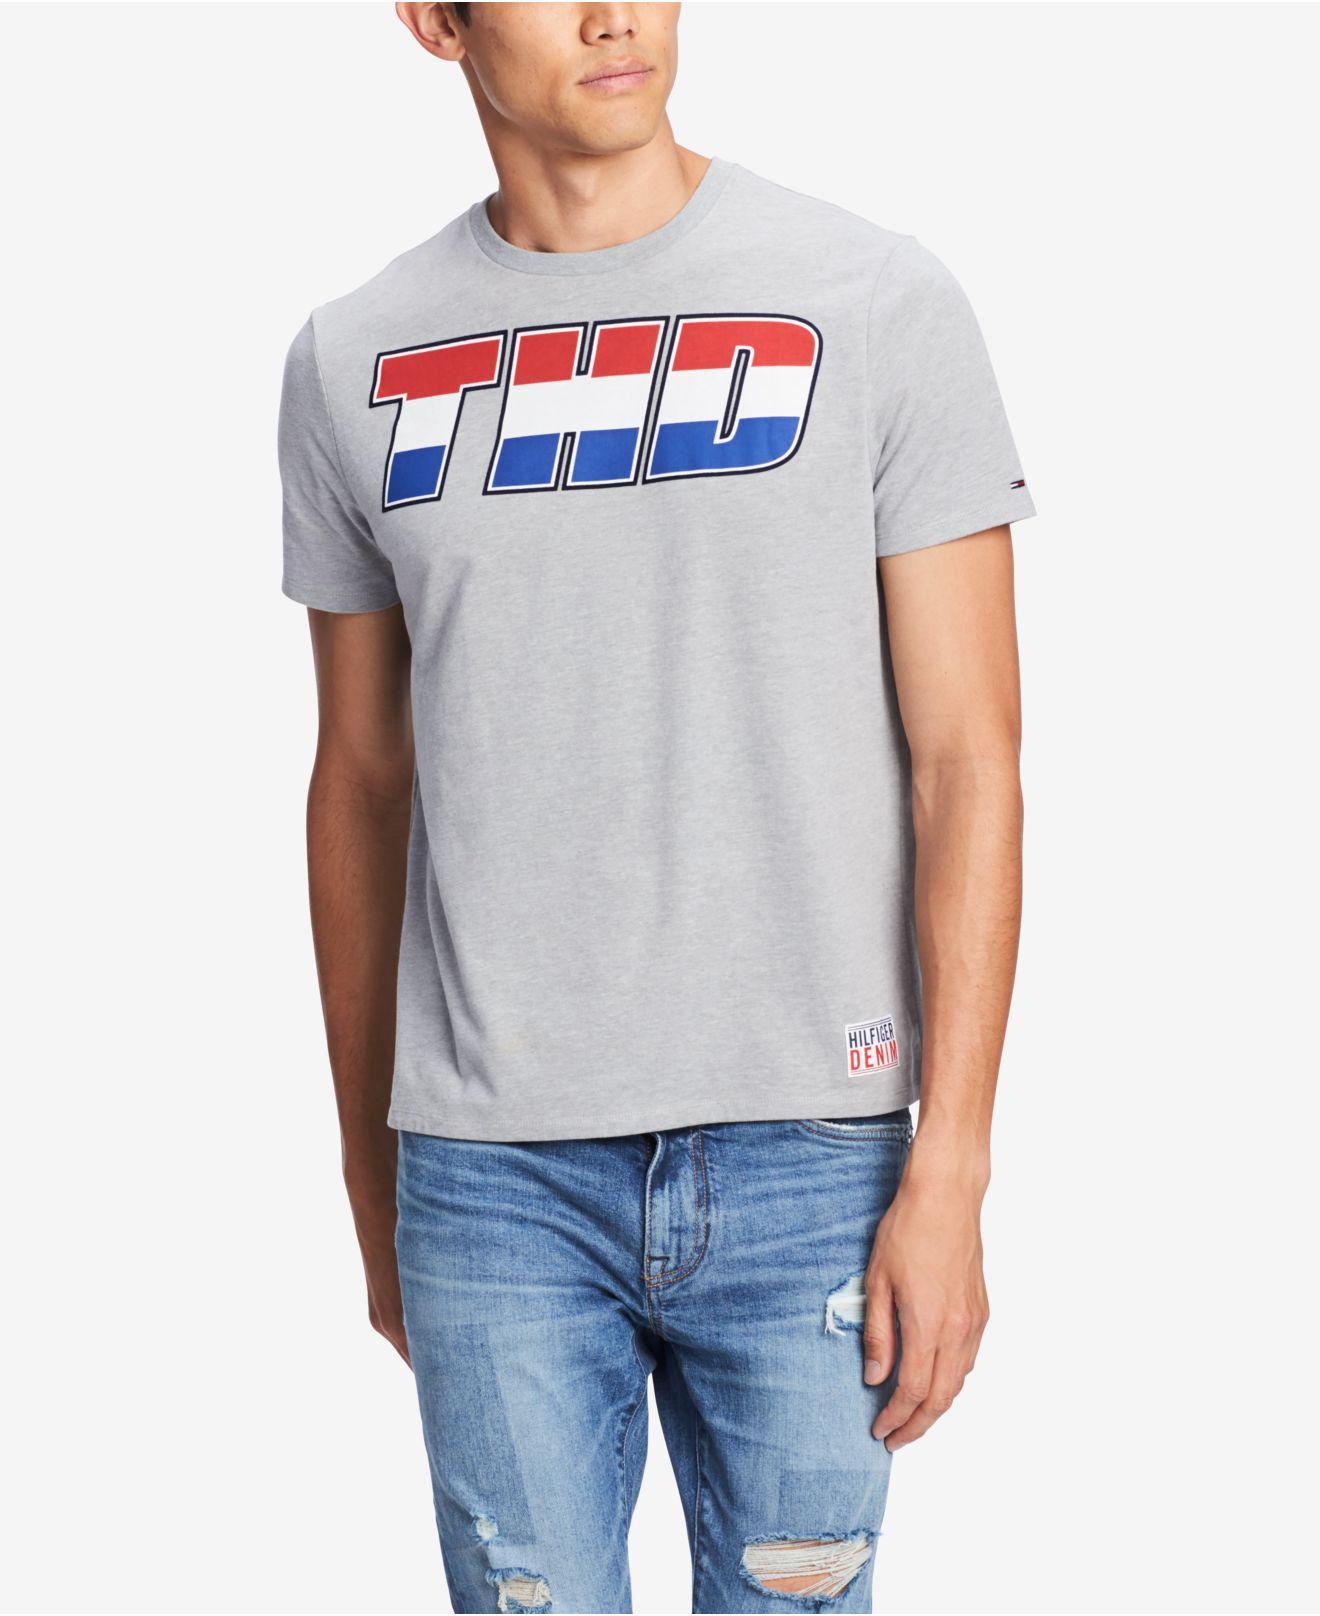 83ca8582b8bda6 Tommy Hilfiger. Men s Gray Sternards Graphic T-shirt